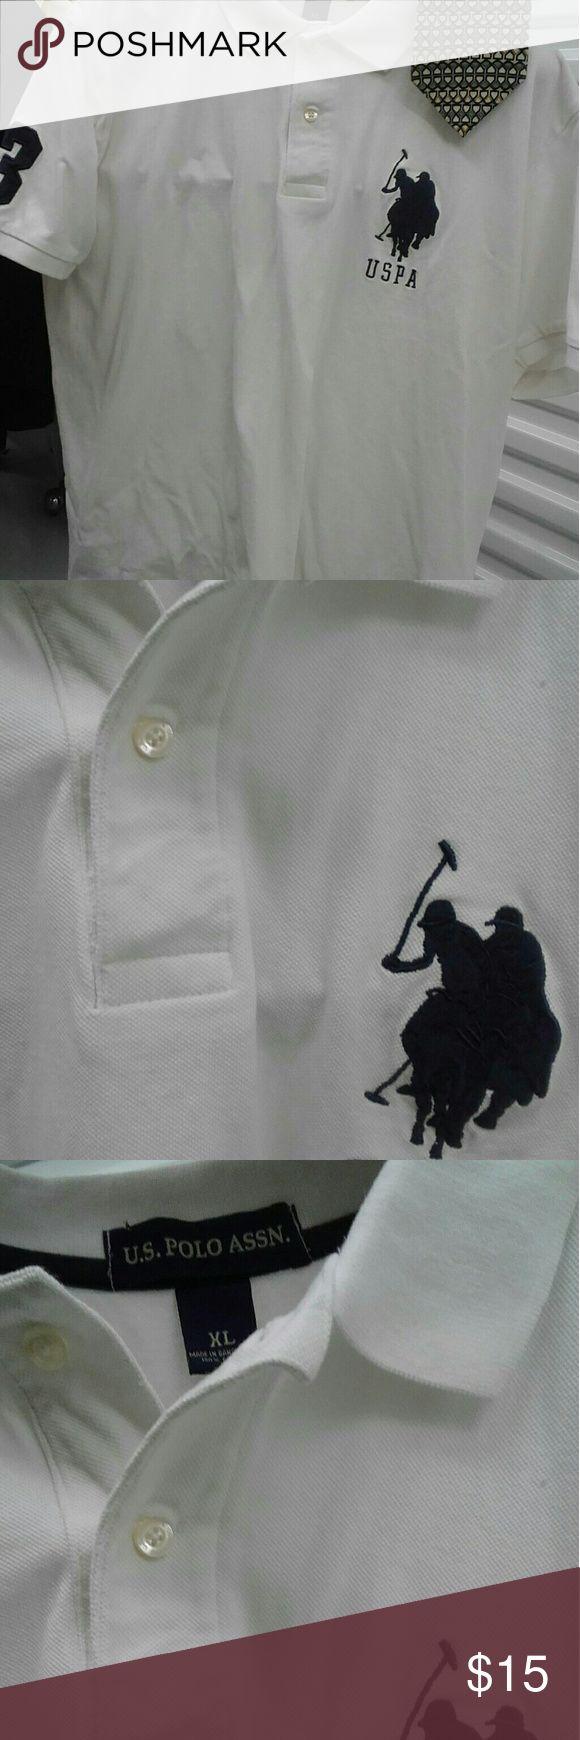 Polo shirt szXL $15 ,+Free necktie Polo shirt szXL $15 sold new $69 + Free necktie us polo association Shirts Polos